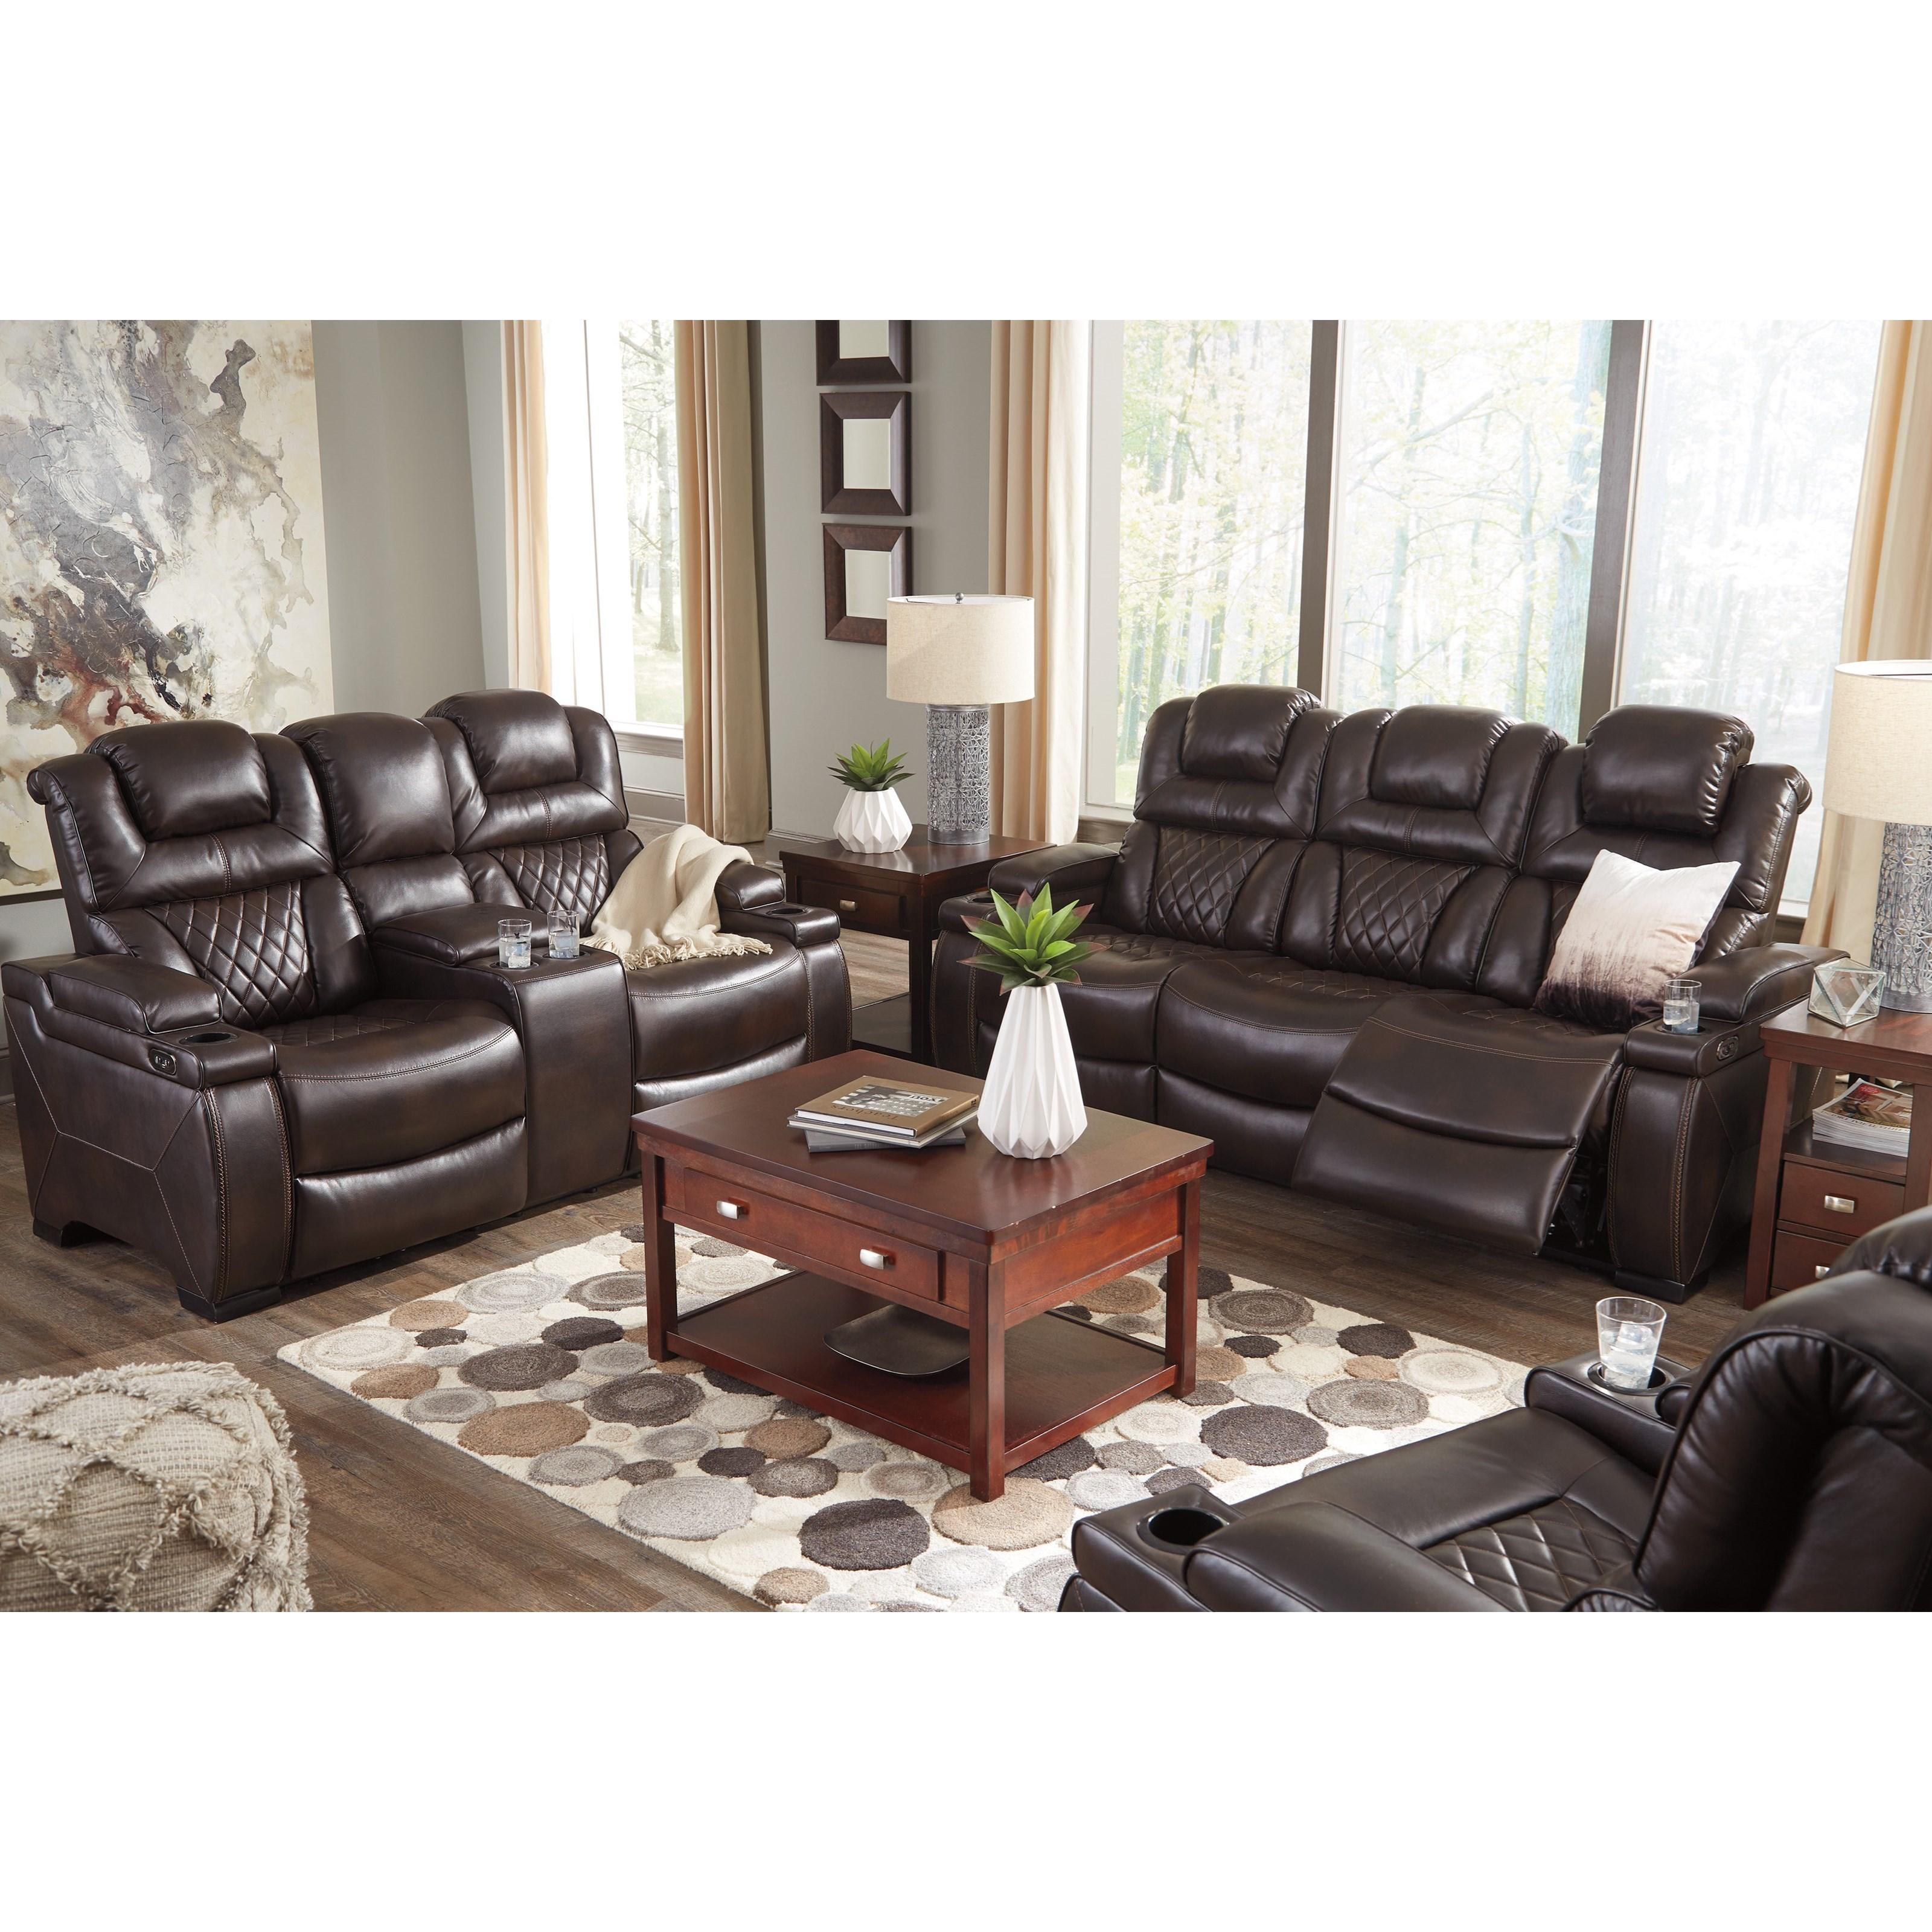 Signature design by ashley warnerton 7540718 power for Ashley furniture appleton